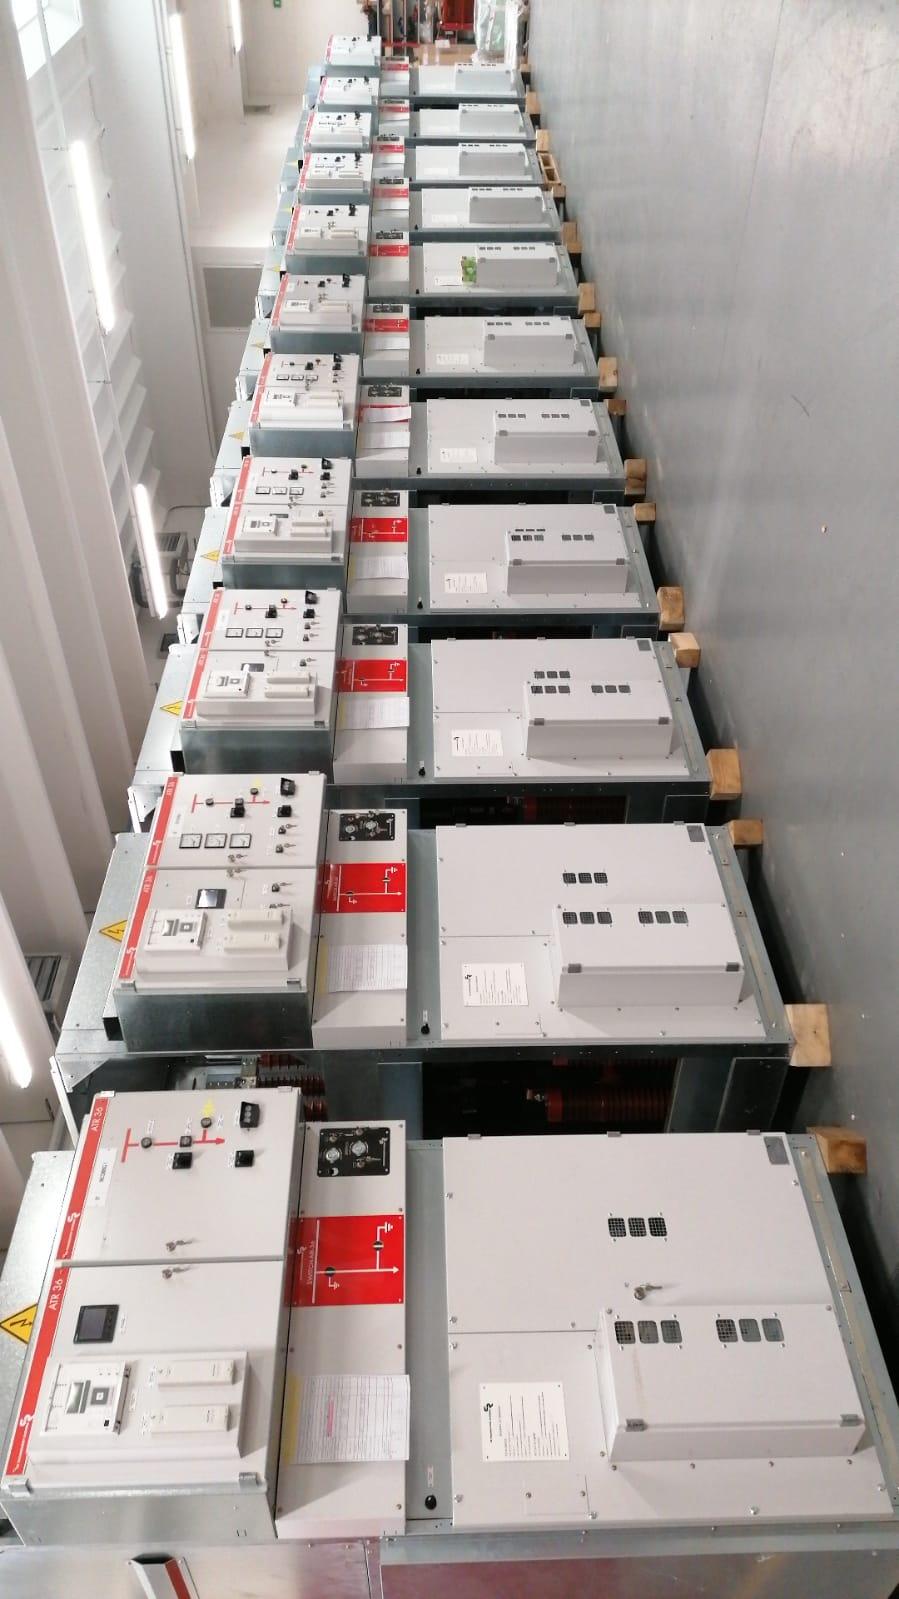 2 medium-voltage MV electrical switchgears for Syrian steelwork plant.